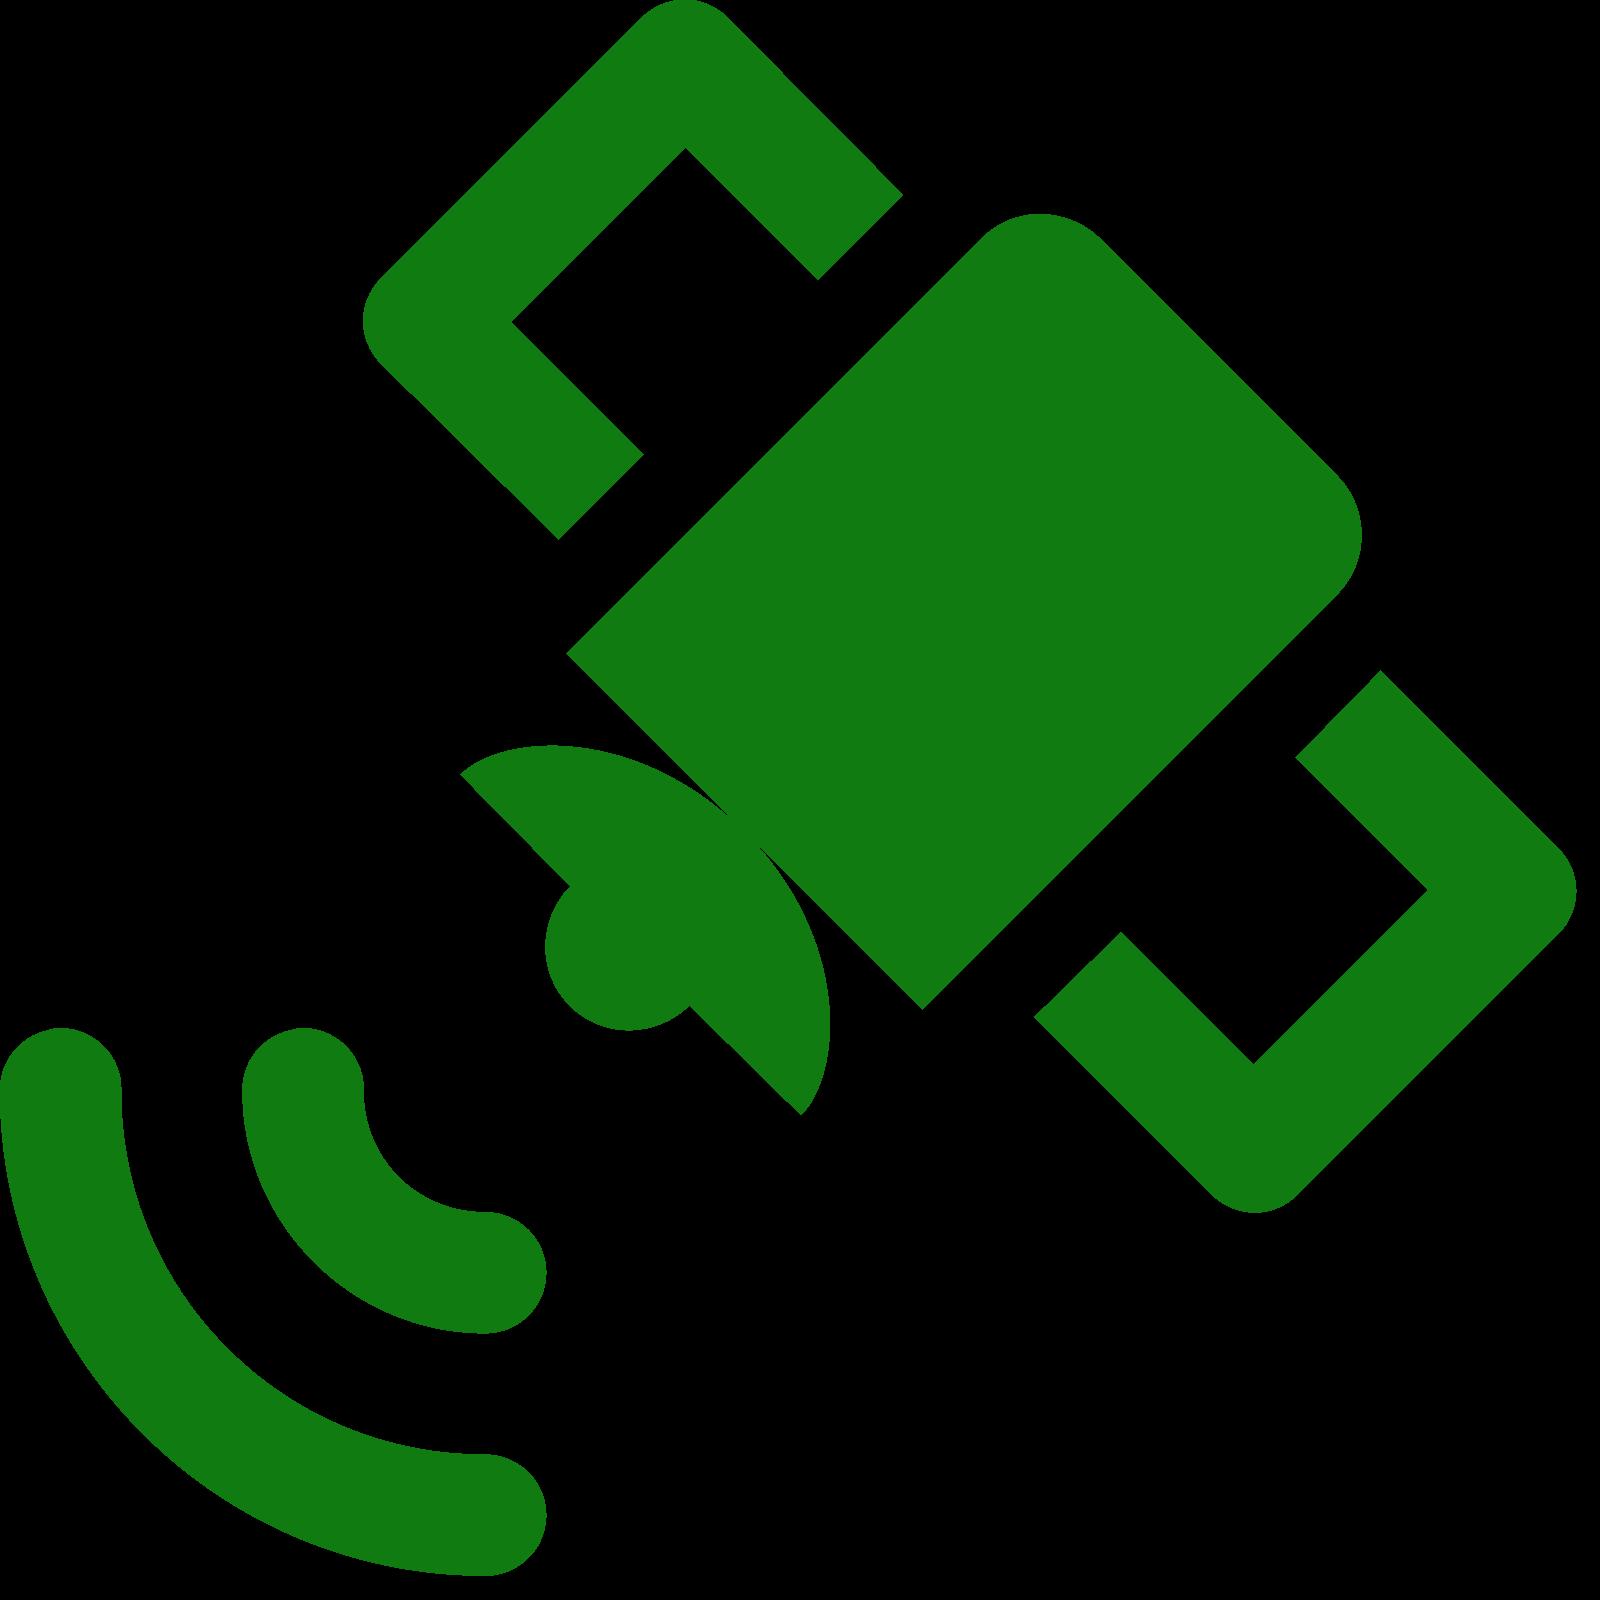 Computer icons blocks clip. Gps clipart satellite signal